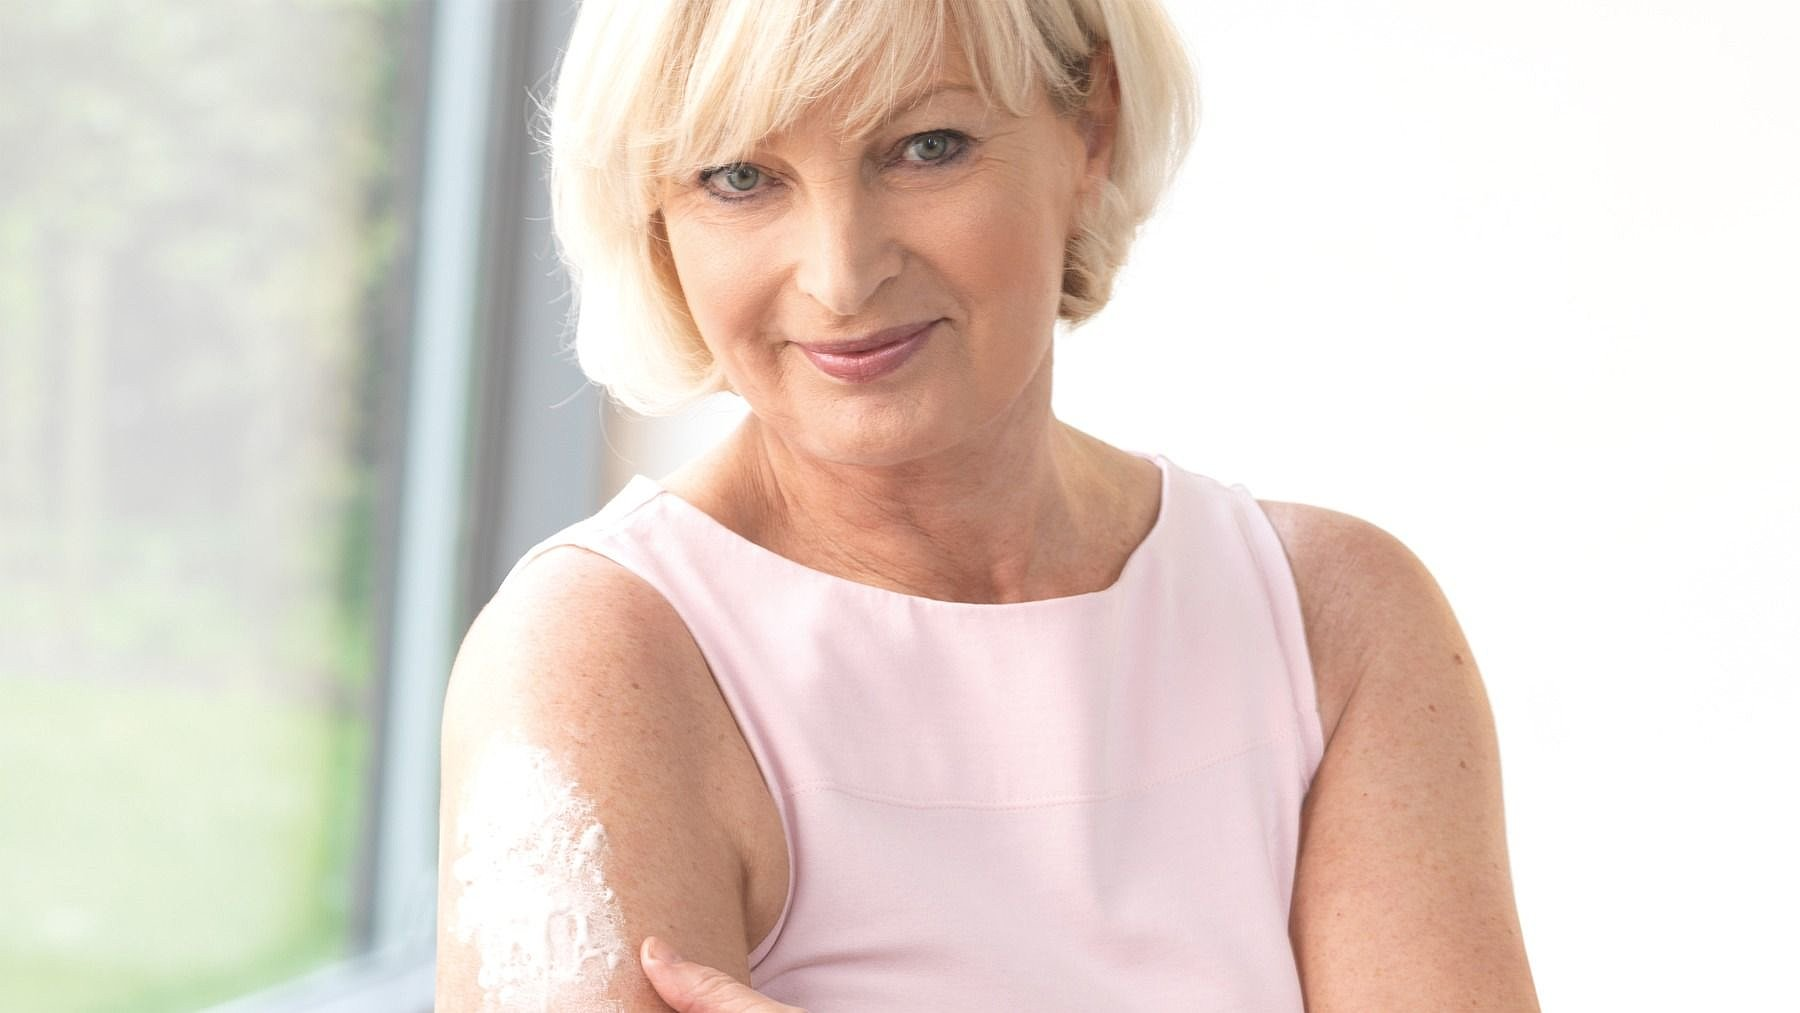 Medi soft skin care